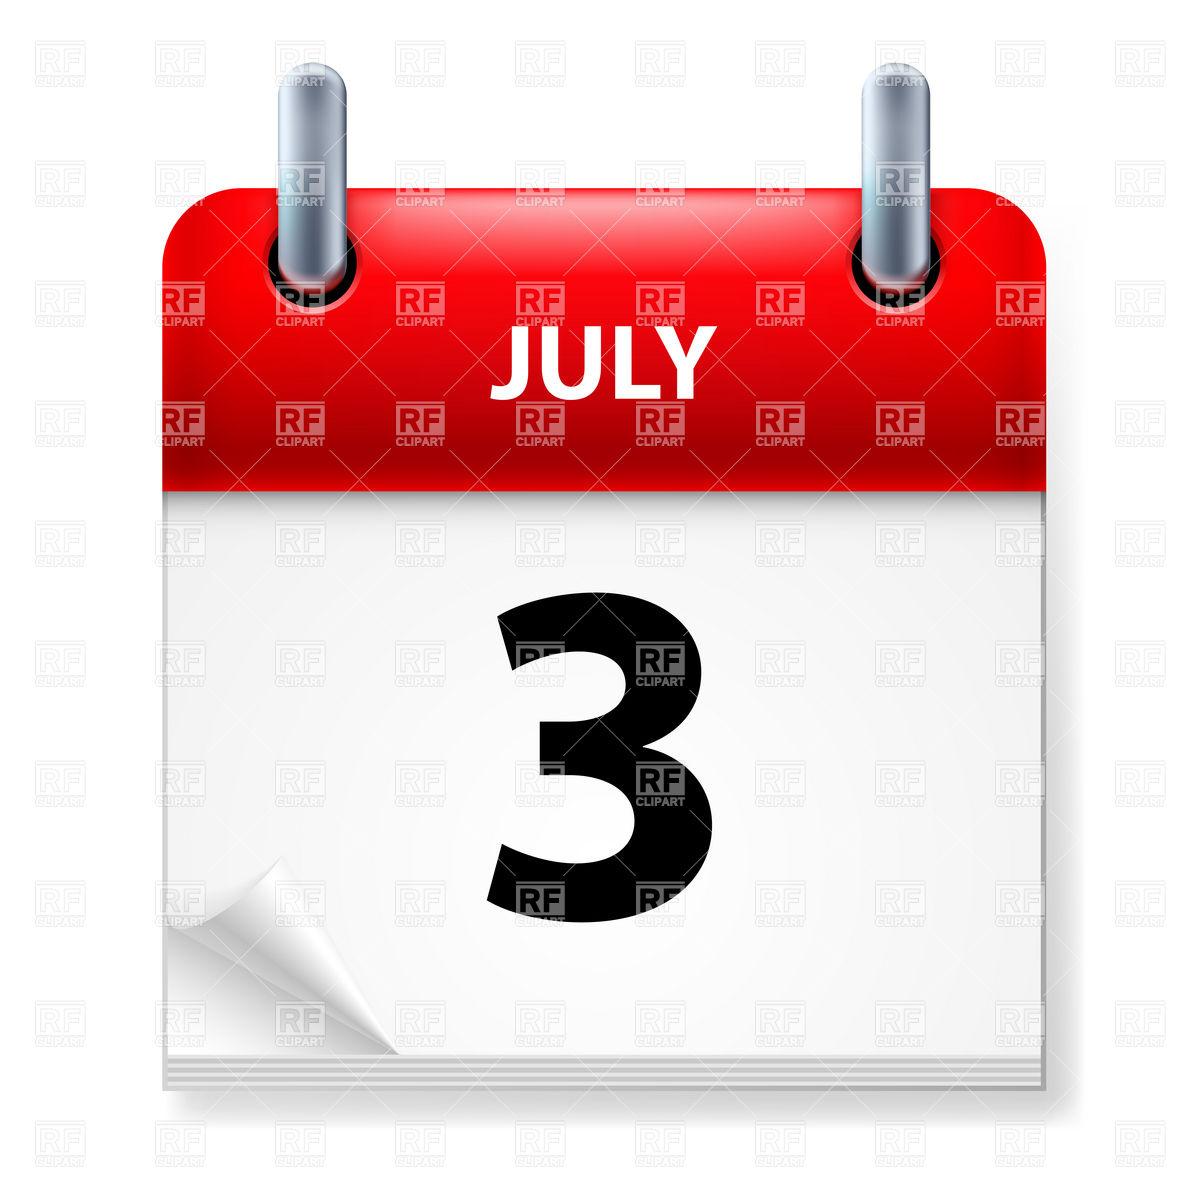 July calendar clipart svg transparent stock 3 of July - calendar icon Vector Image #7212 – RFclipart svg transparent stock